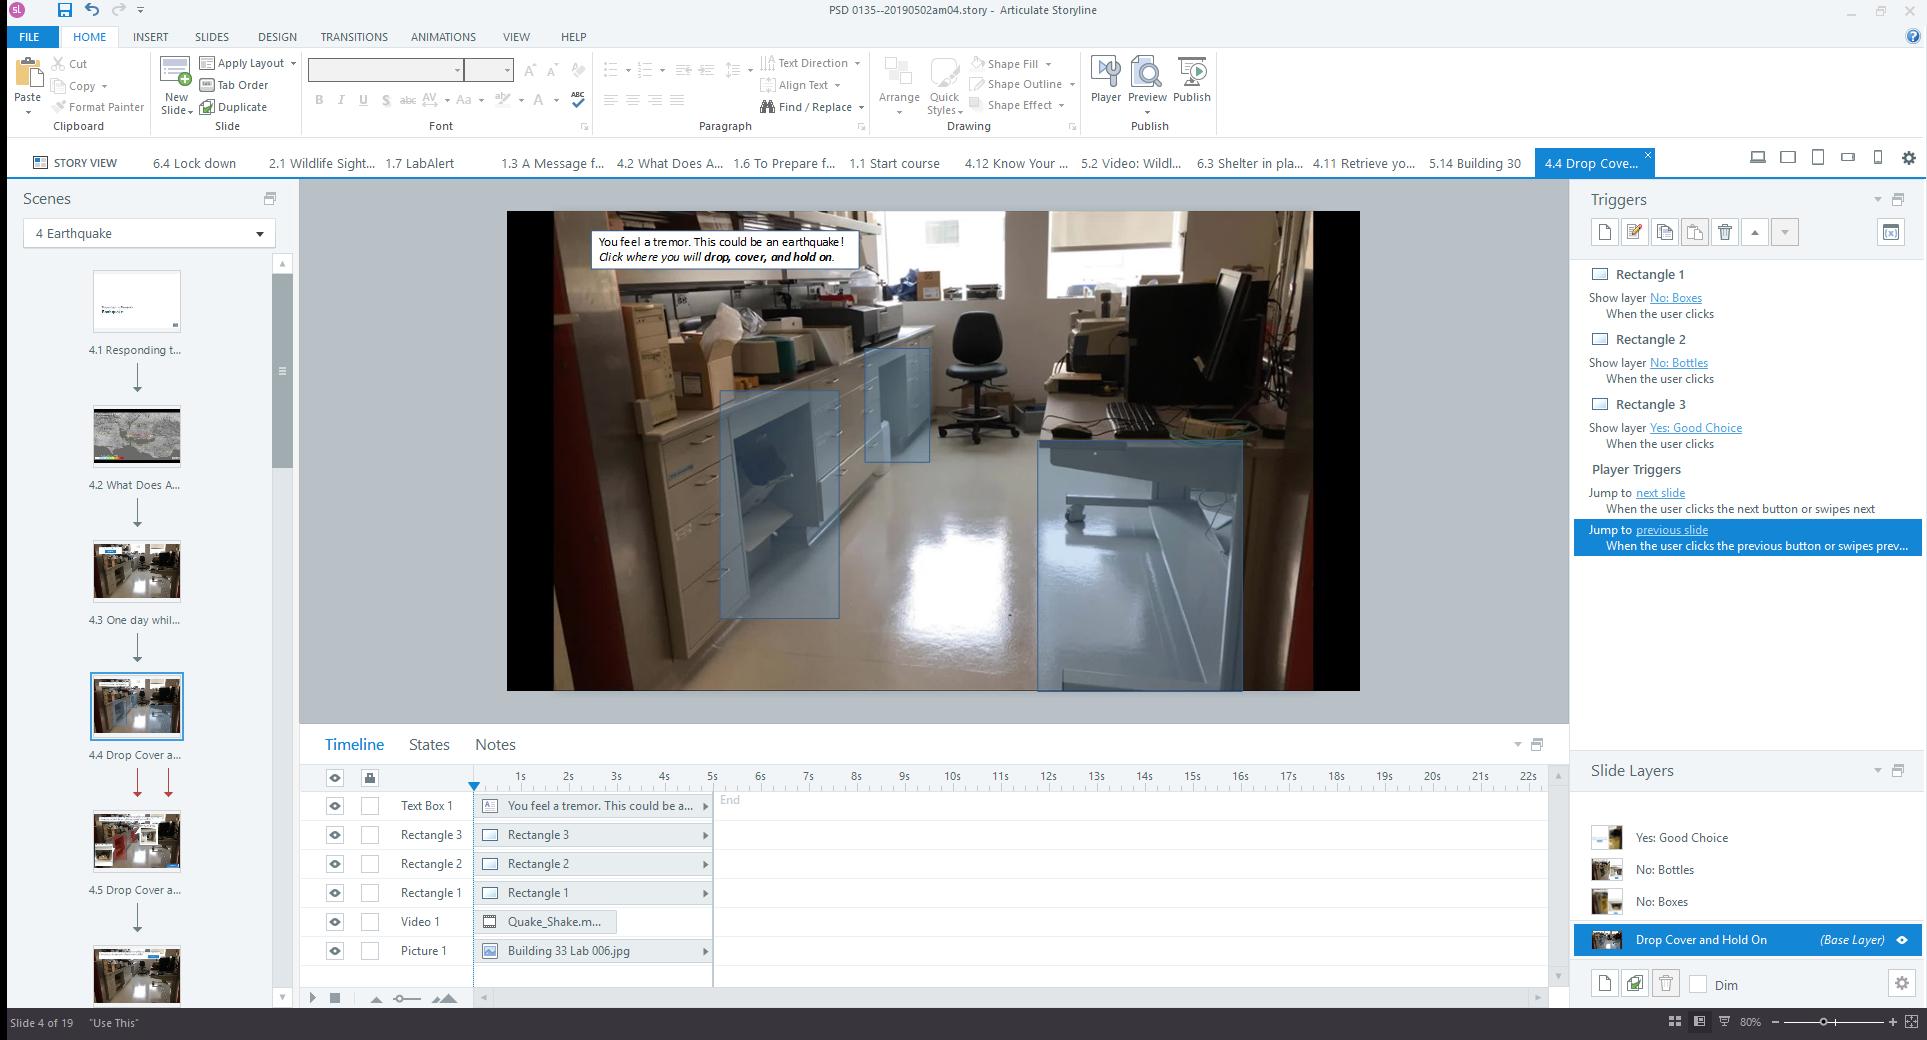 Storyline Edit screen, full